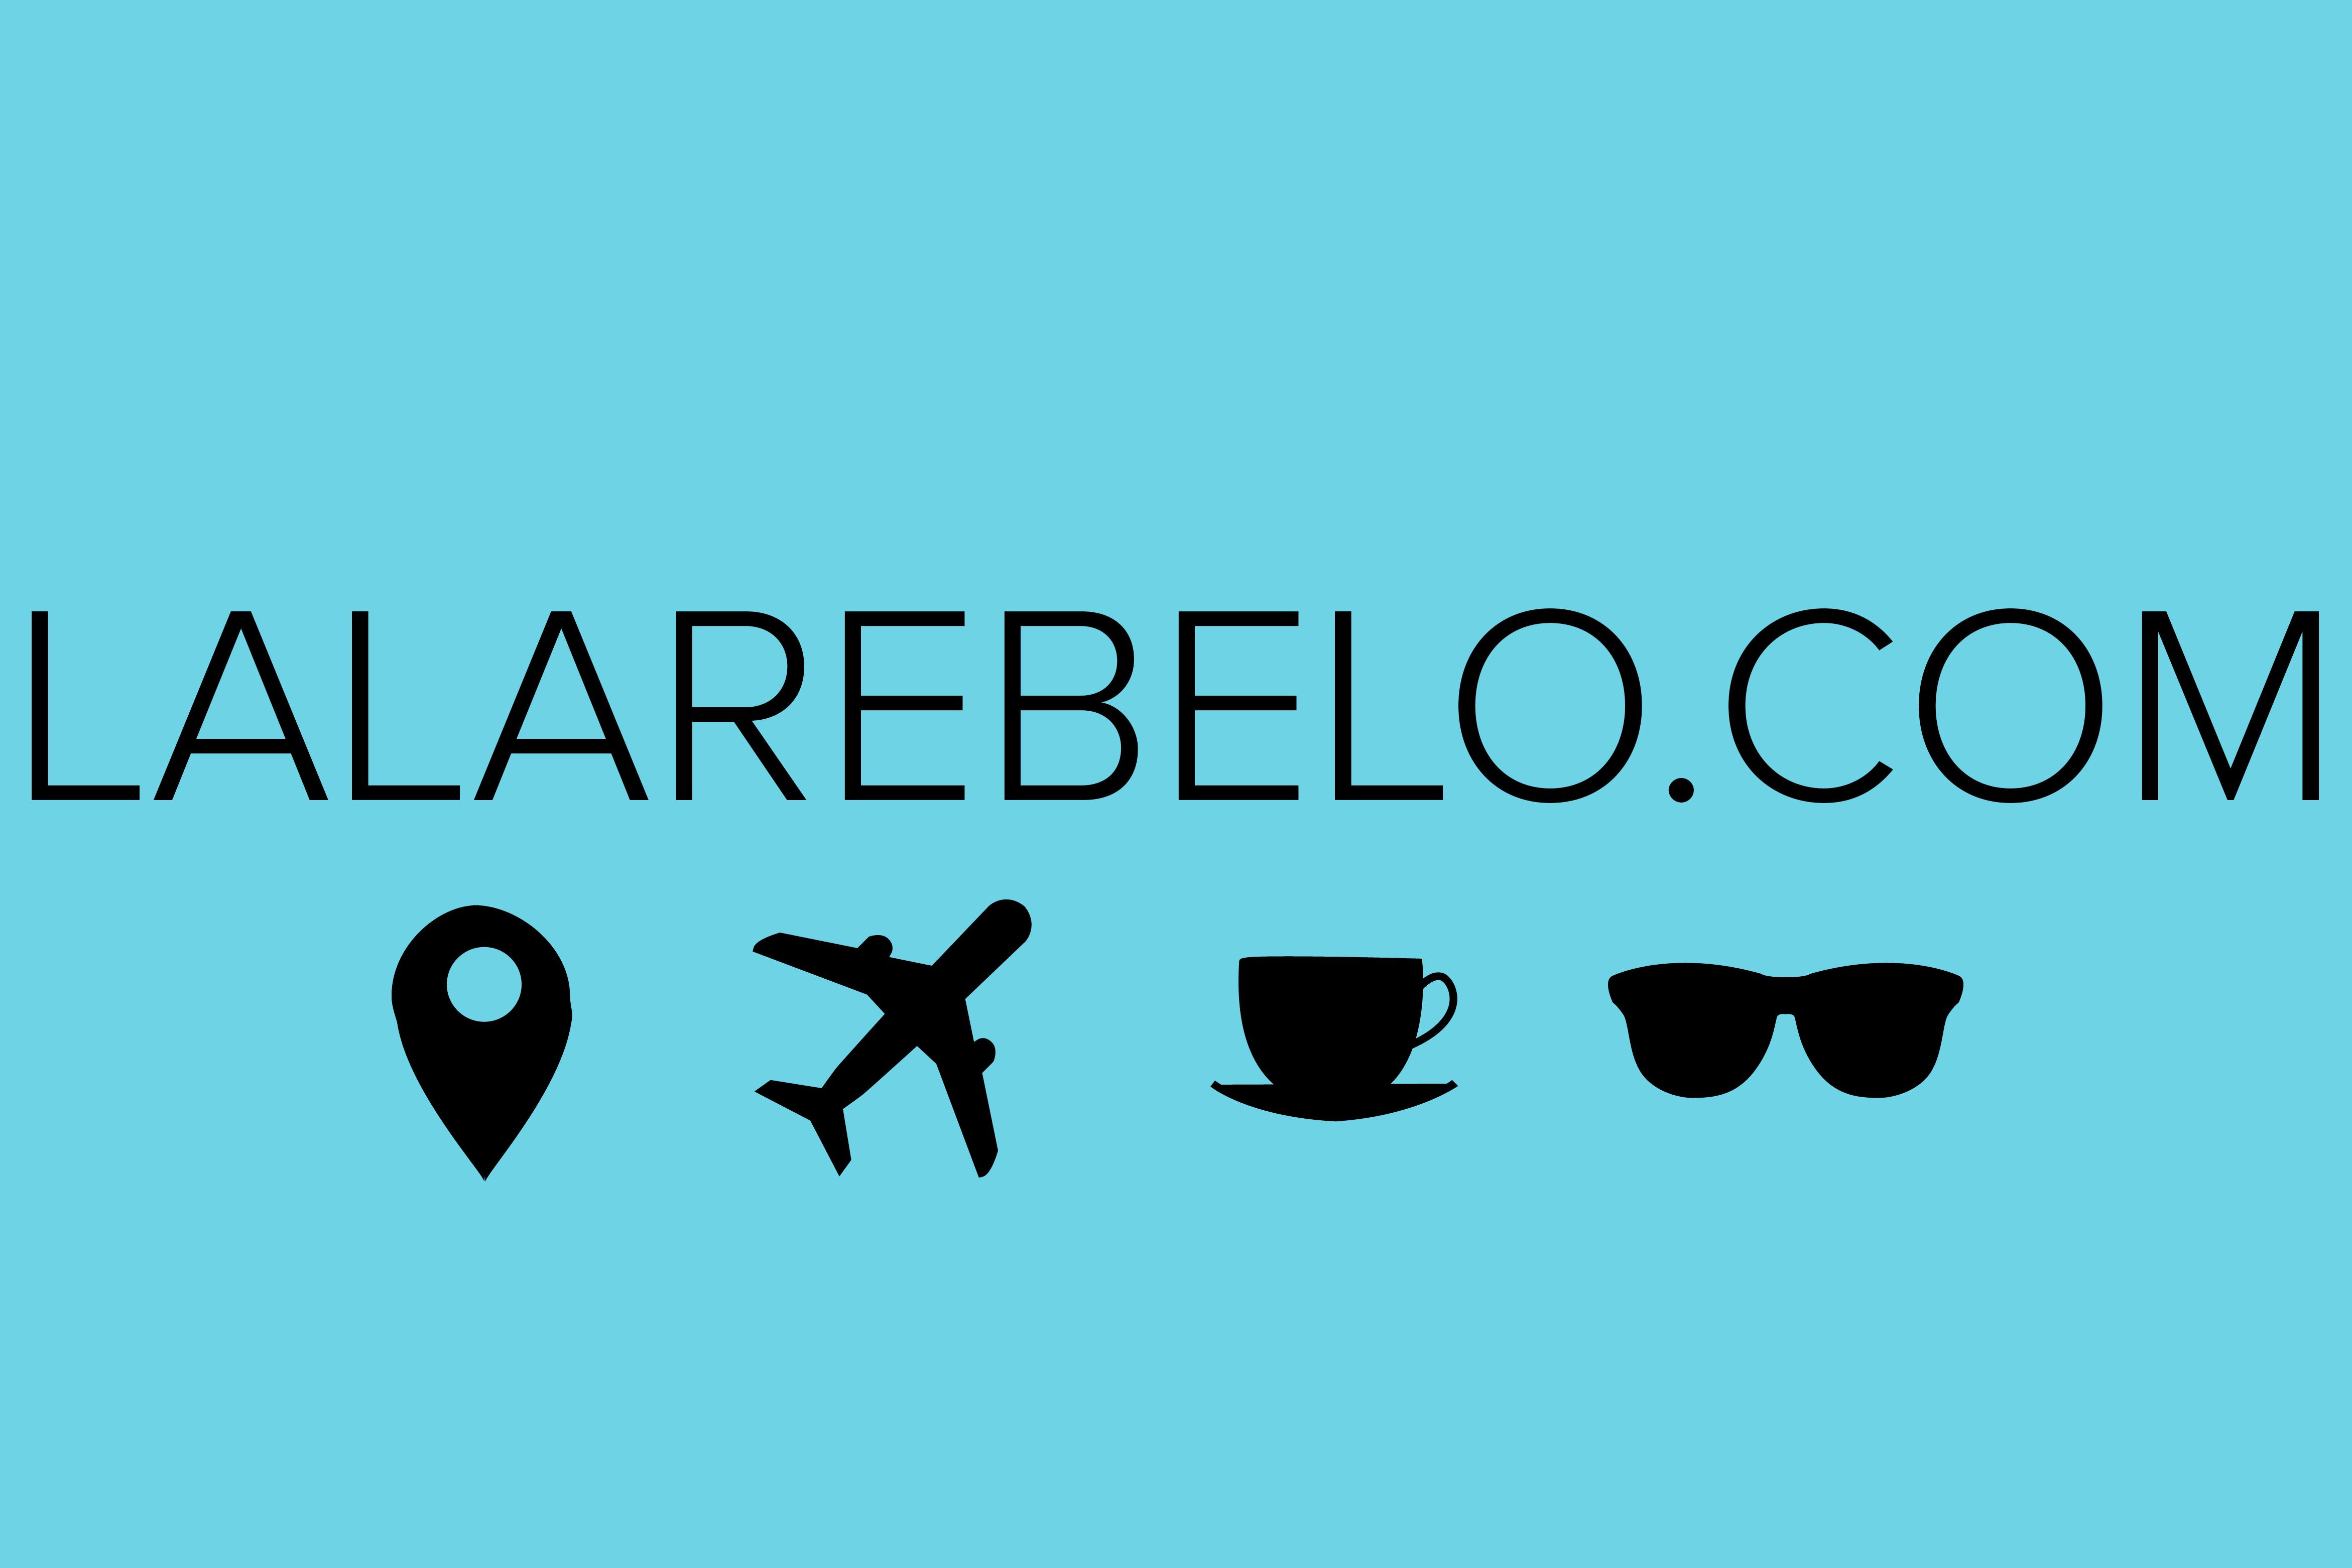 logo-lalarebelo-site-icones-fundo-turquesa